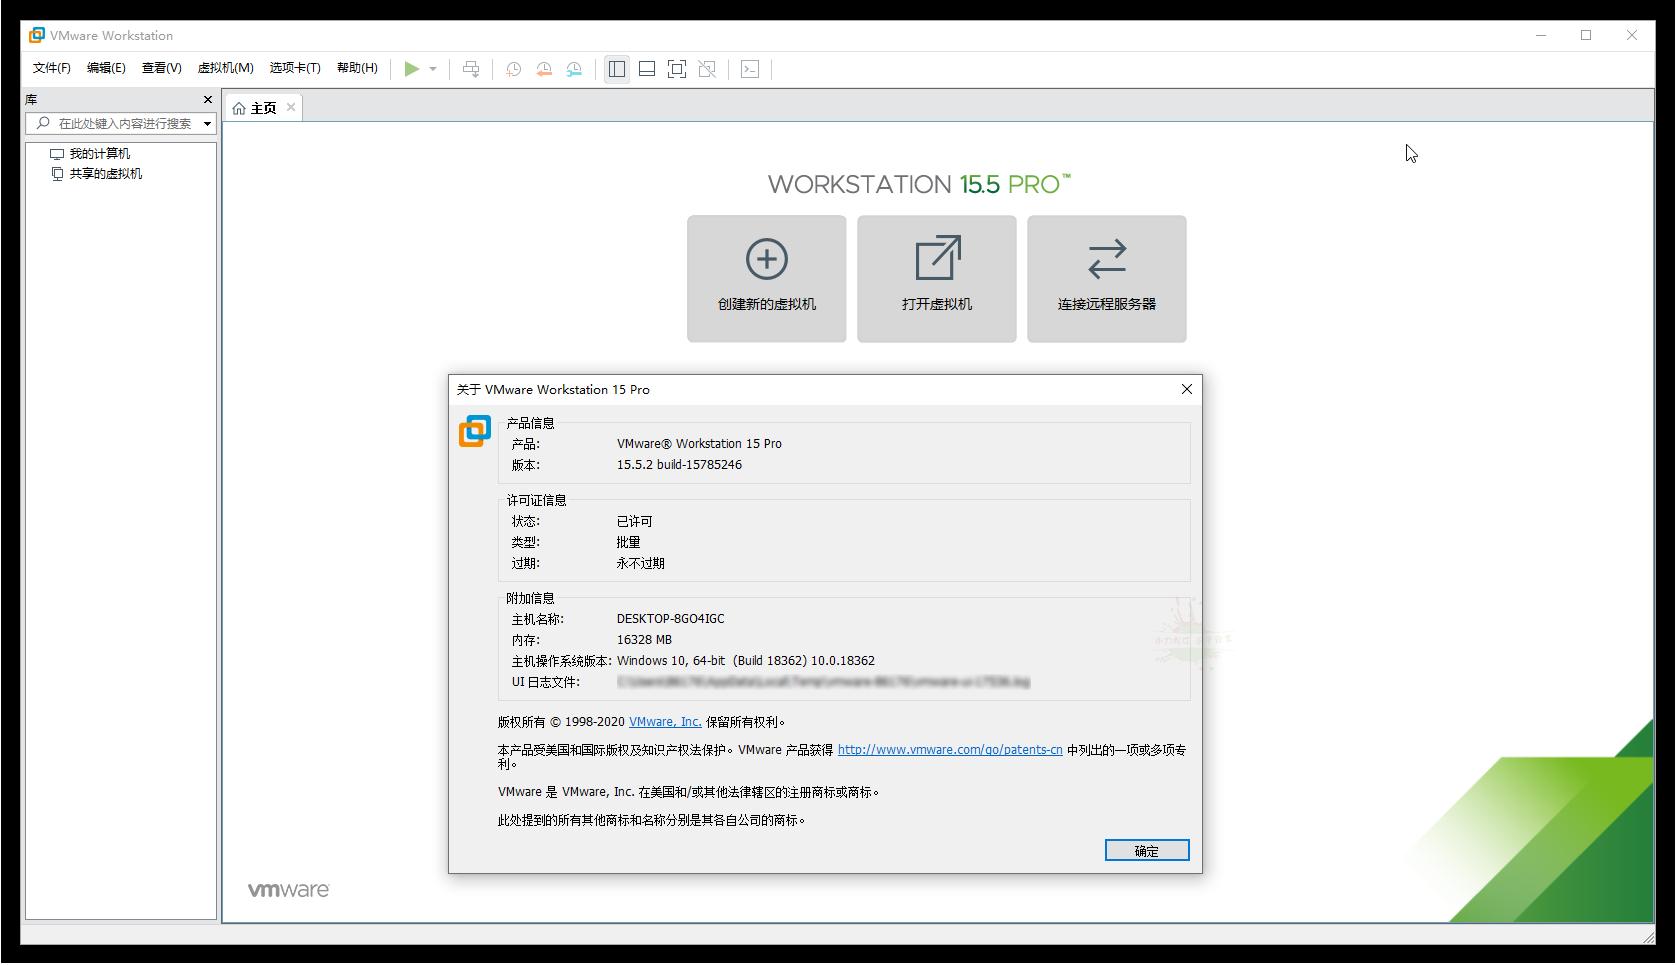 VMware虚拟机精简版 软件测试必备无需激活